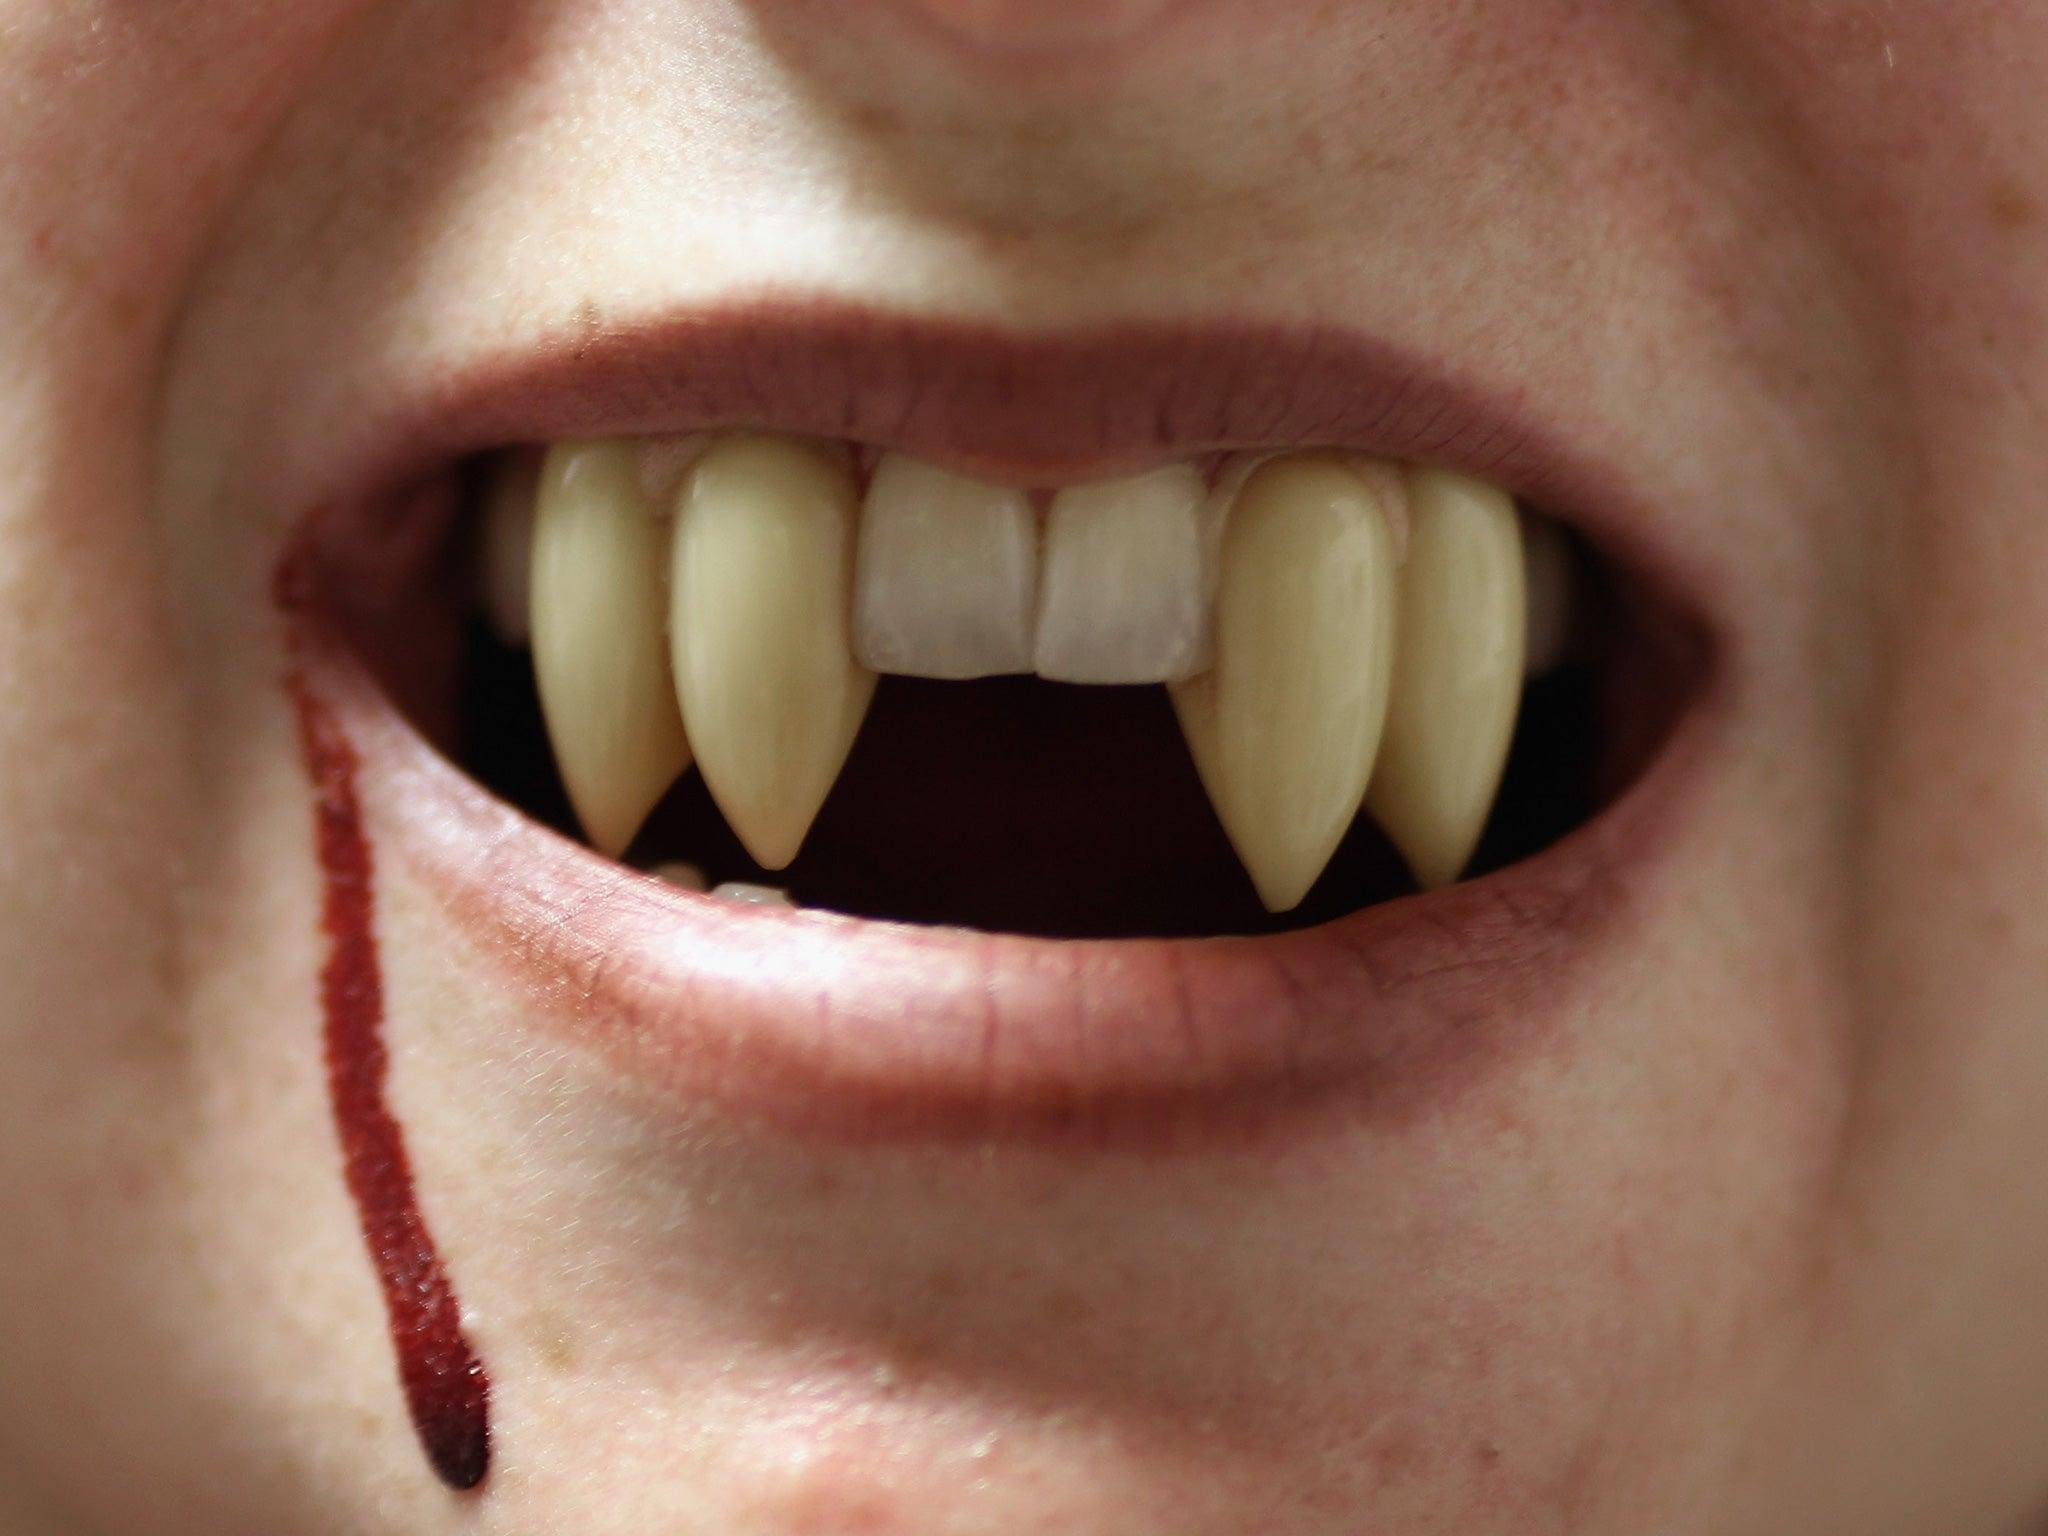 Vampire dating sites uk in Brisbane